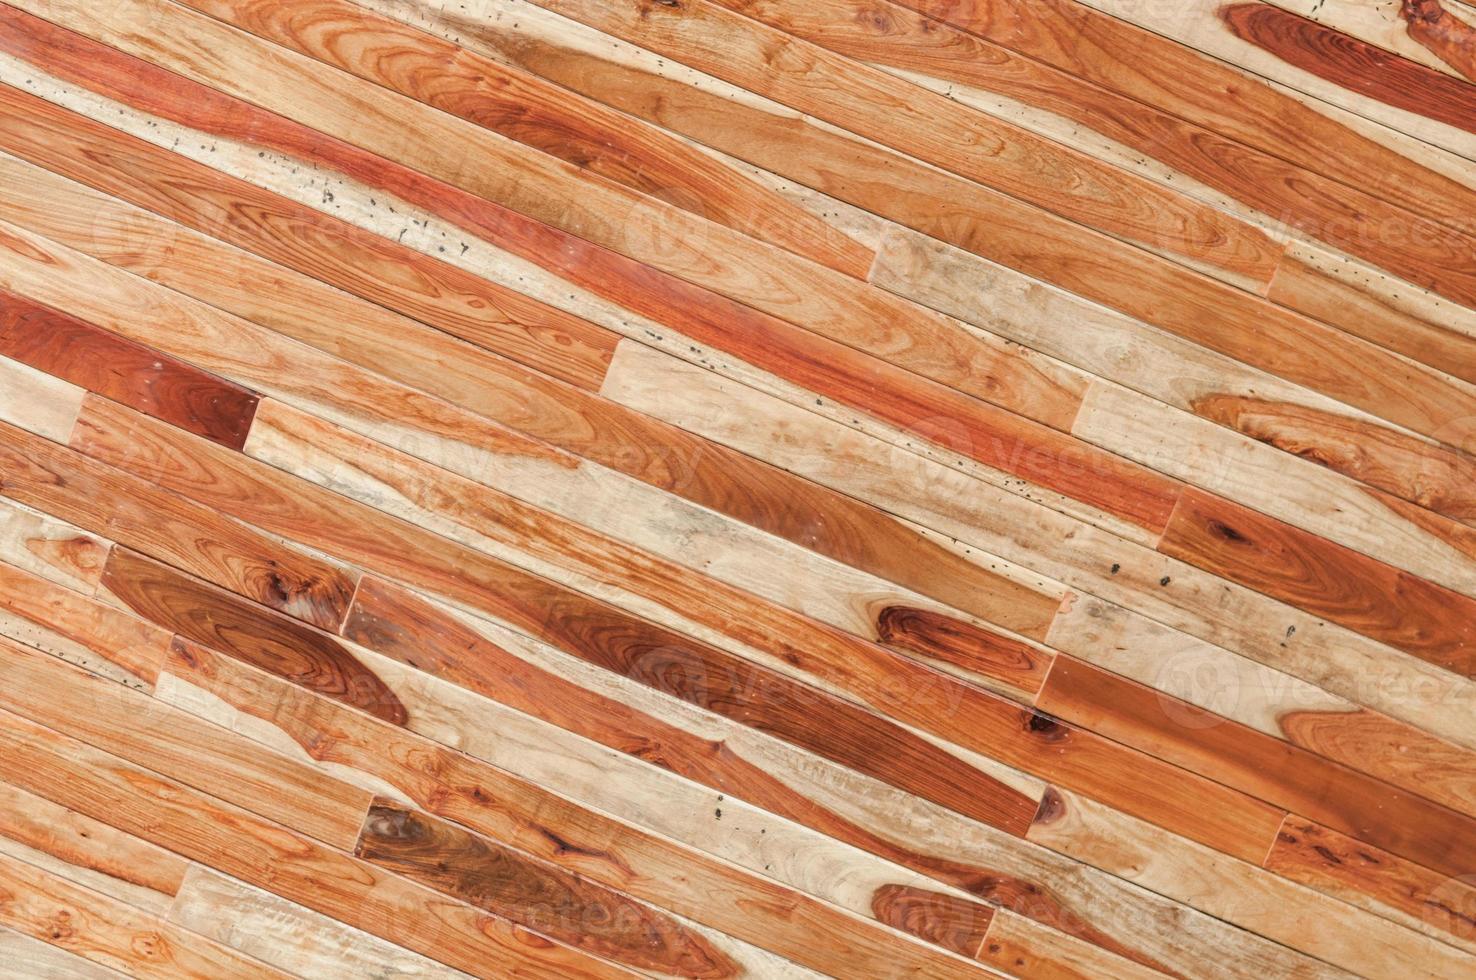 prachtig plafond hout structuur foto